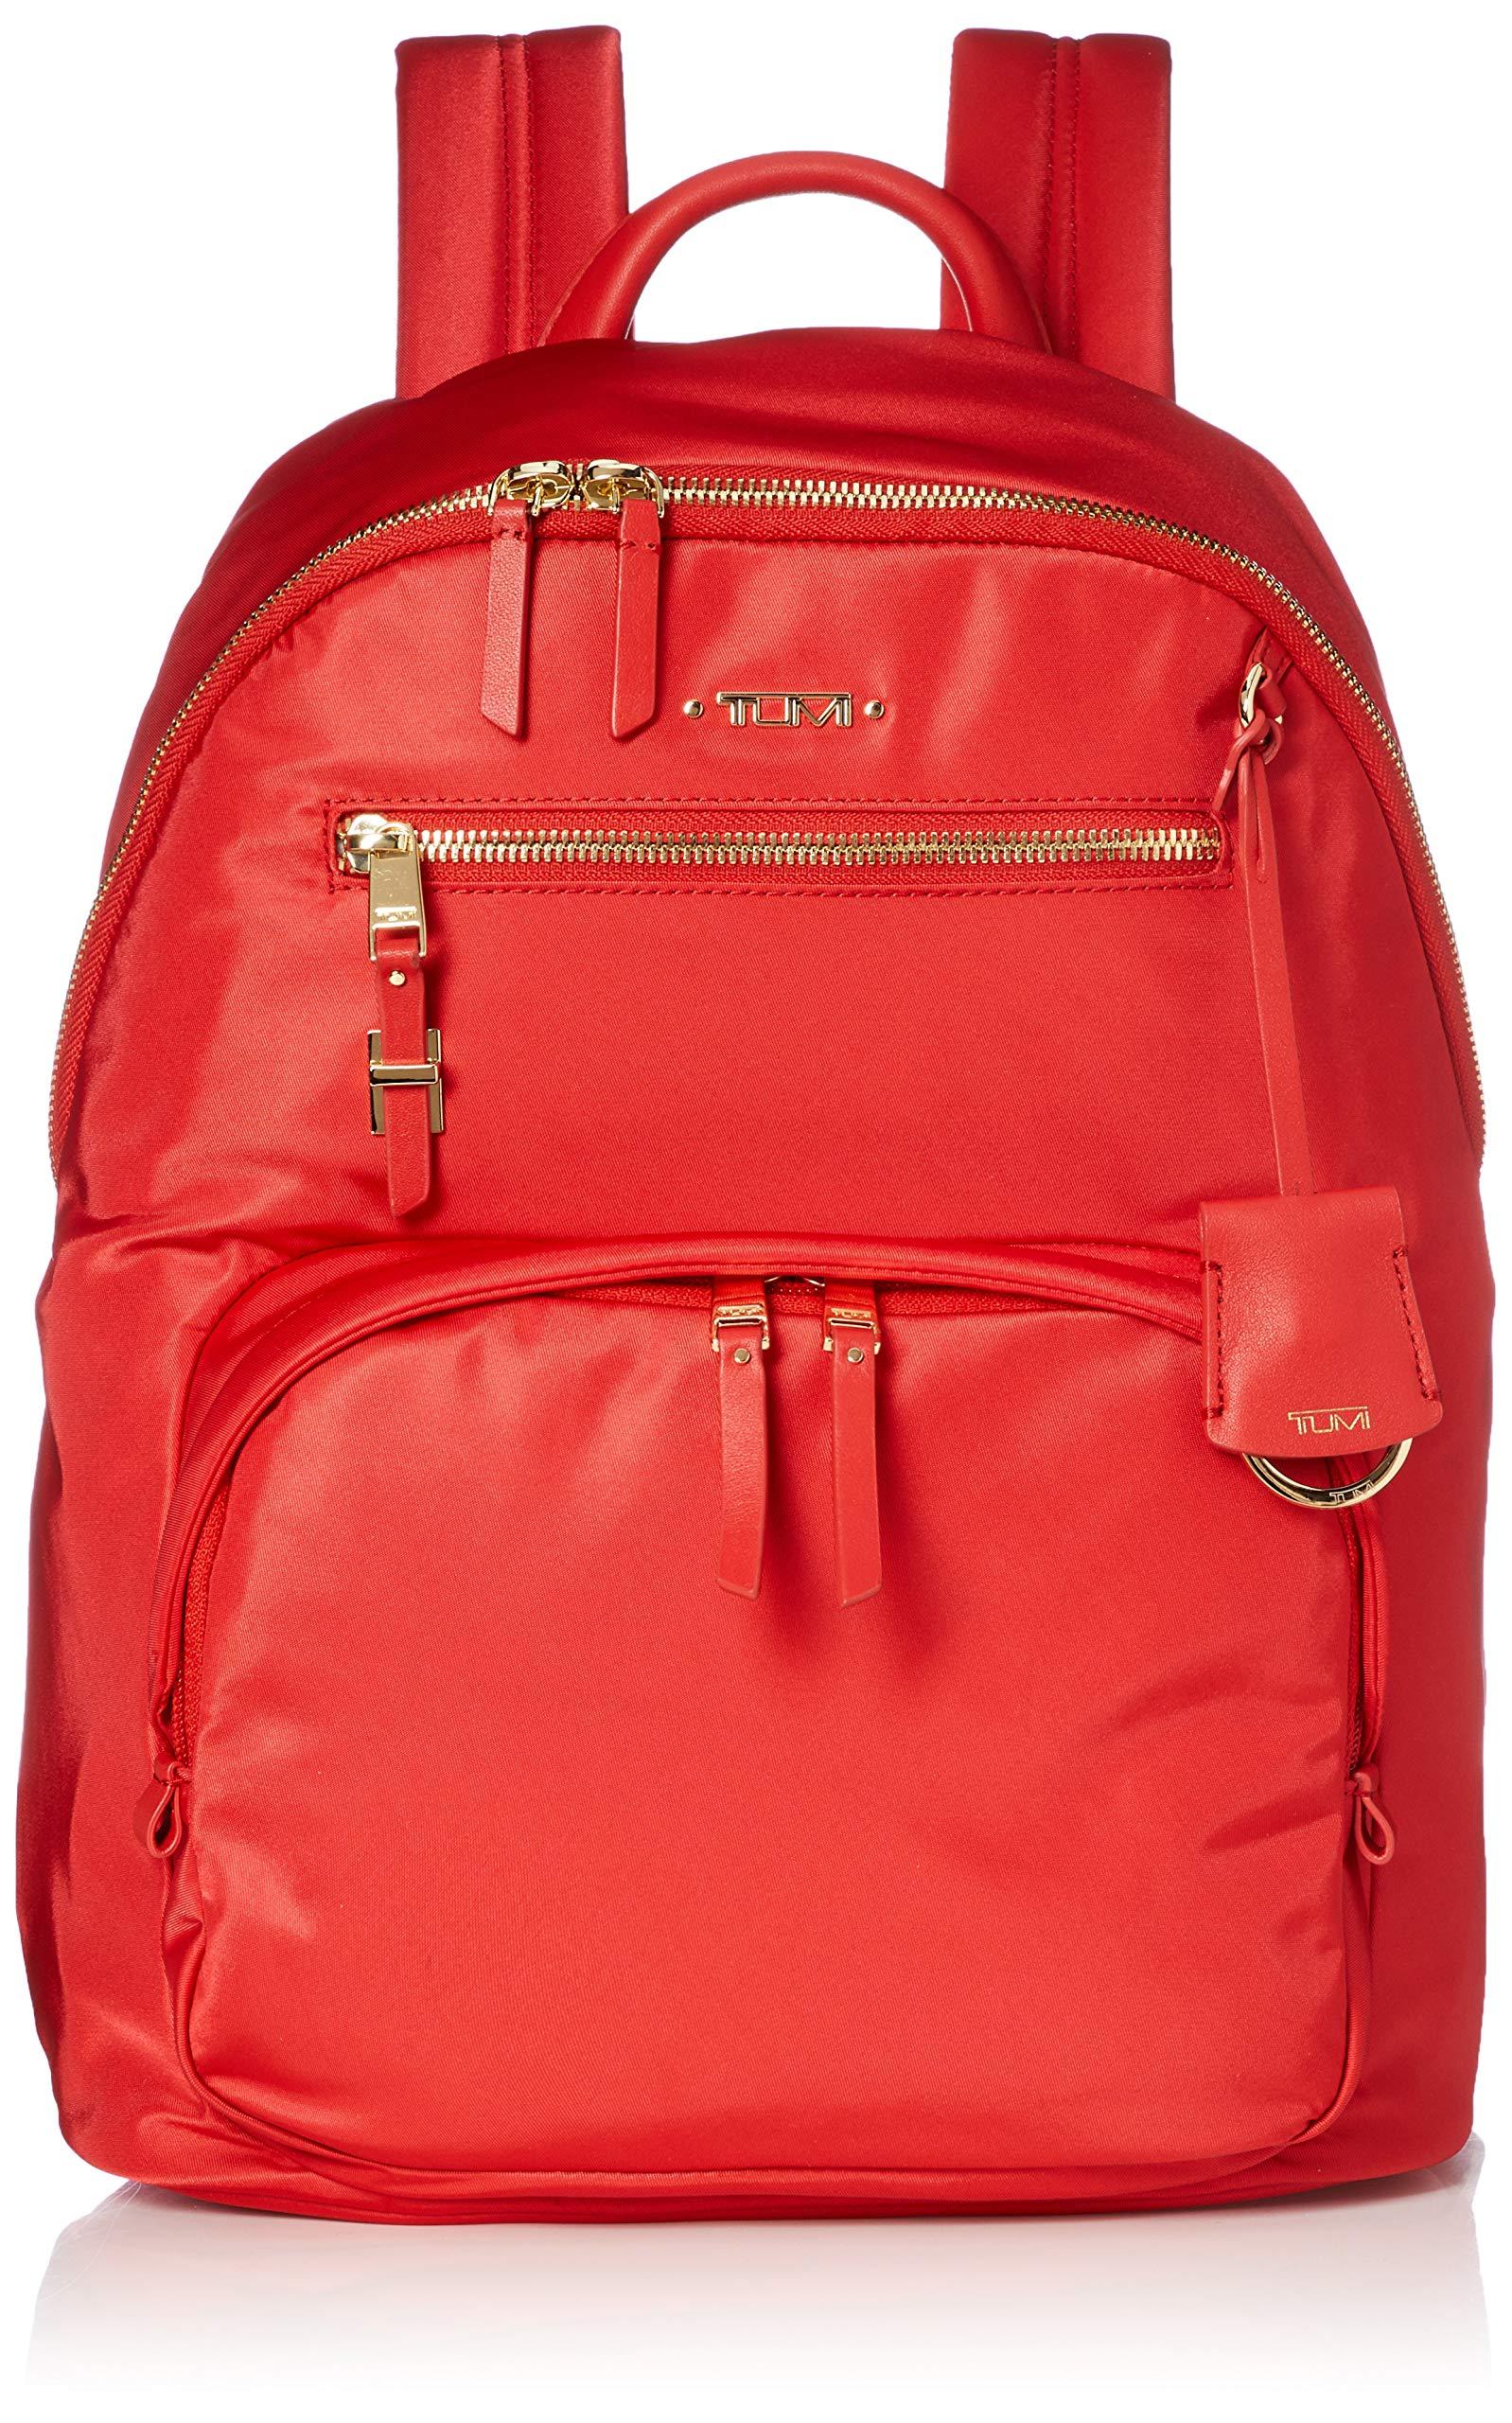 TUMI - Voyageur Halle - Hagen Laptop Backpack - 12 Inch Computer Bag For Women